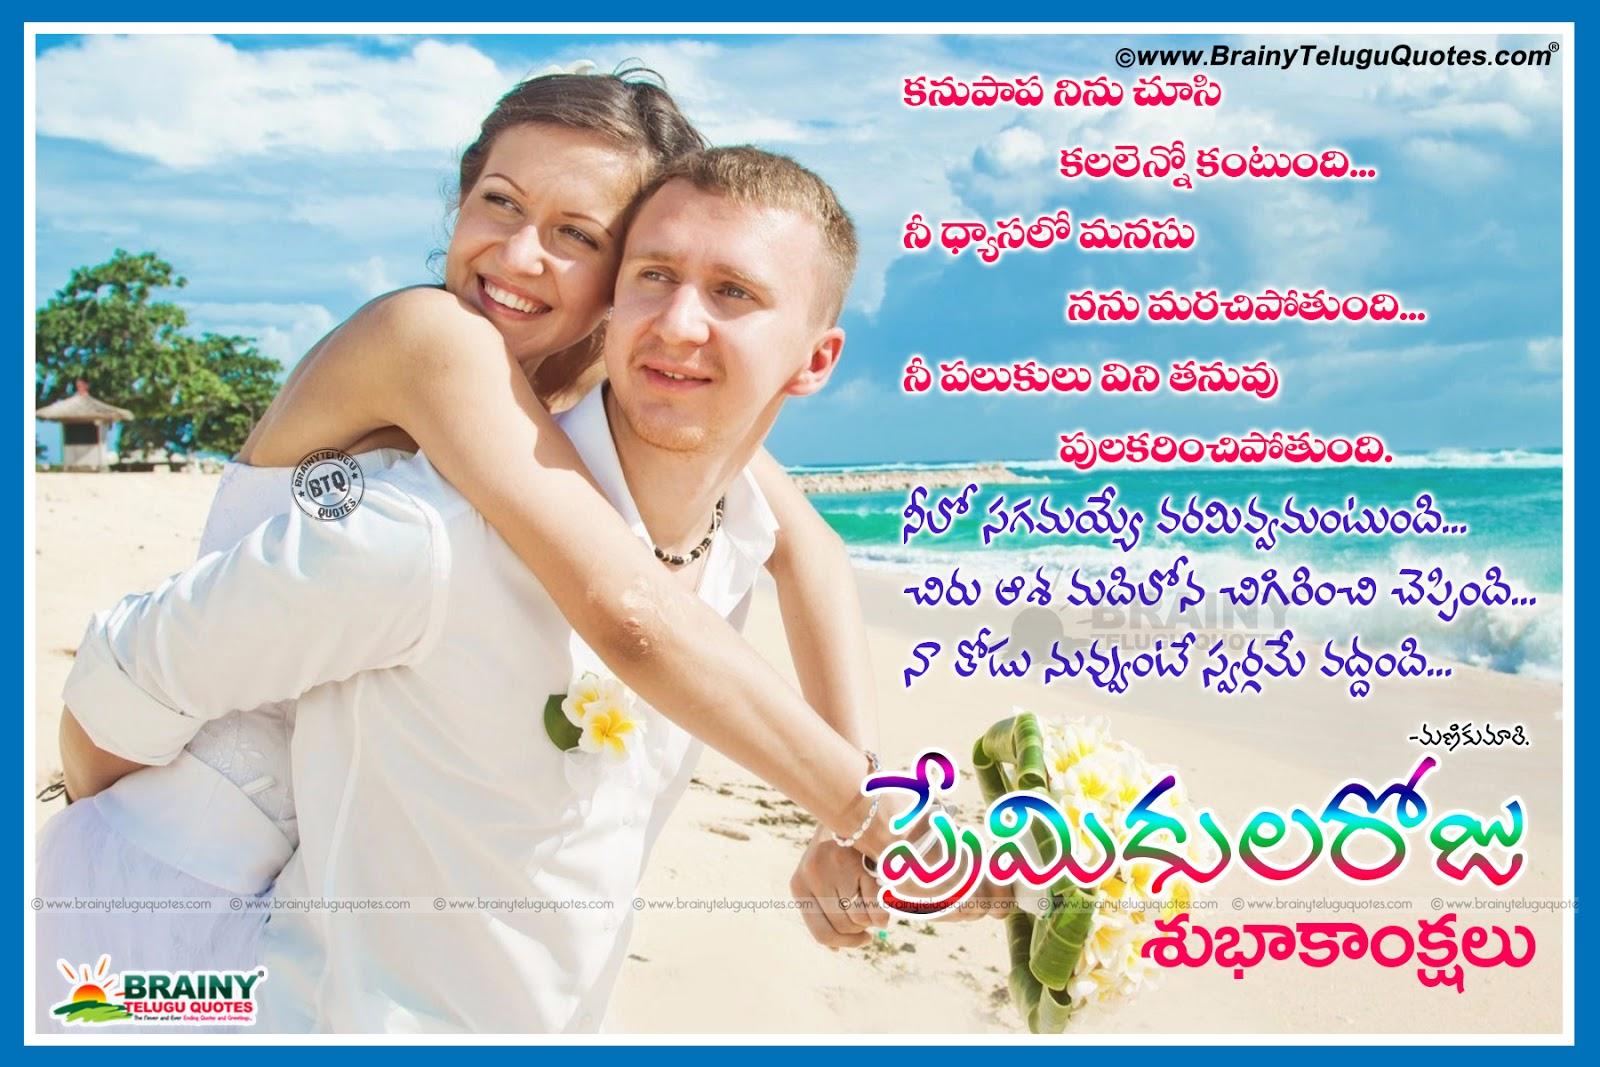 Beautiful girl quotes in telugu